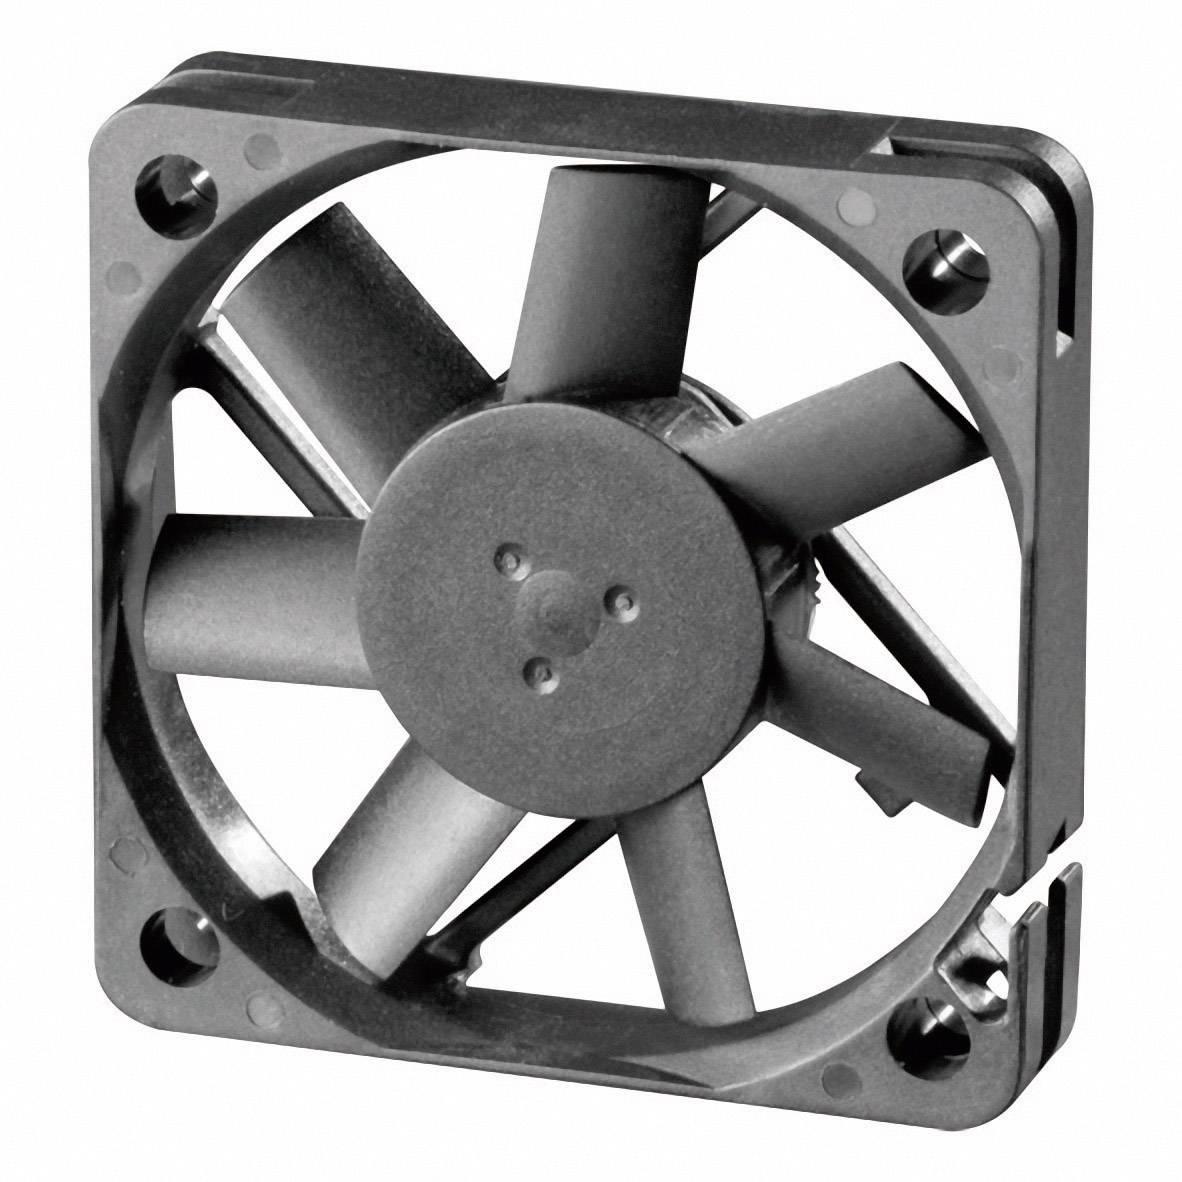 Axiálny ventilátor Sunon EE50101S1-000U-999 EE50101S1-000U-999, 12 V/DC, 29 dB, (d x š x v) 50 x 50 x 10 mm